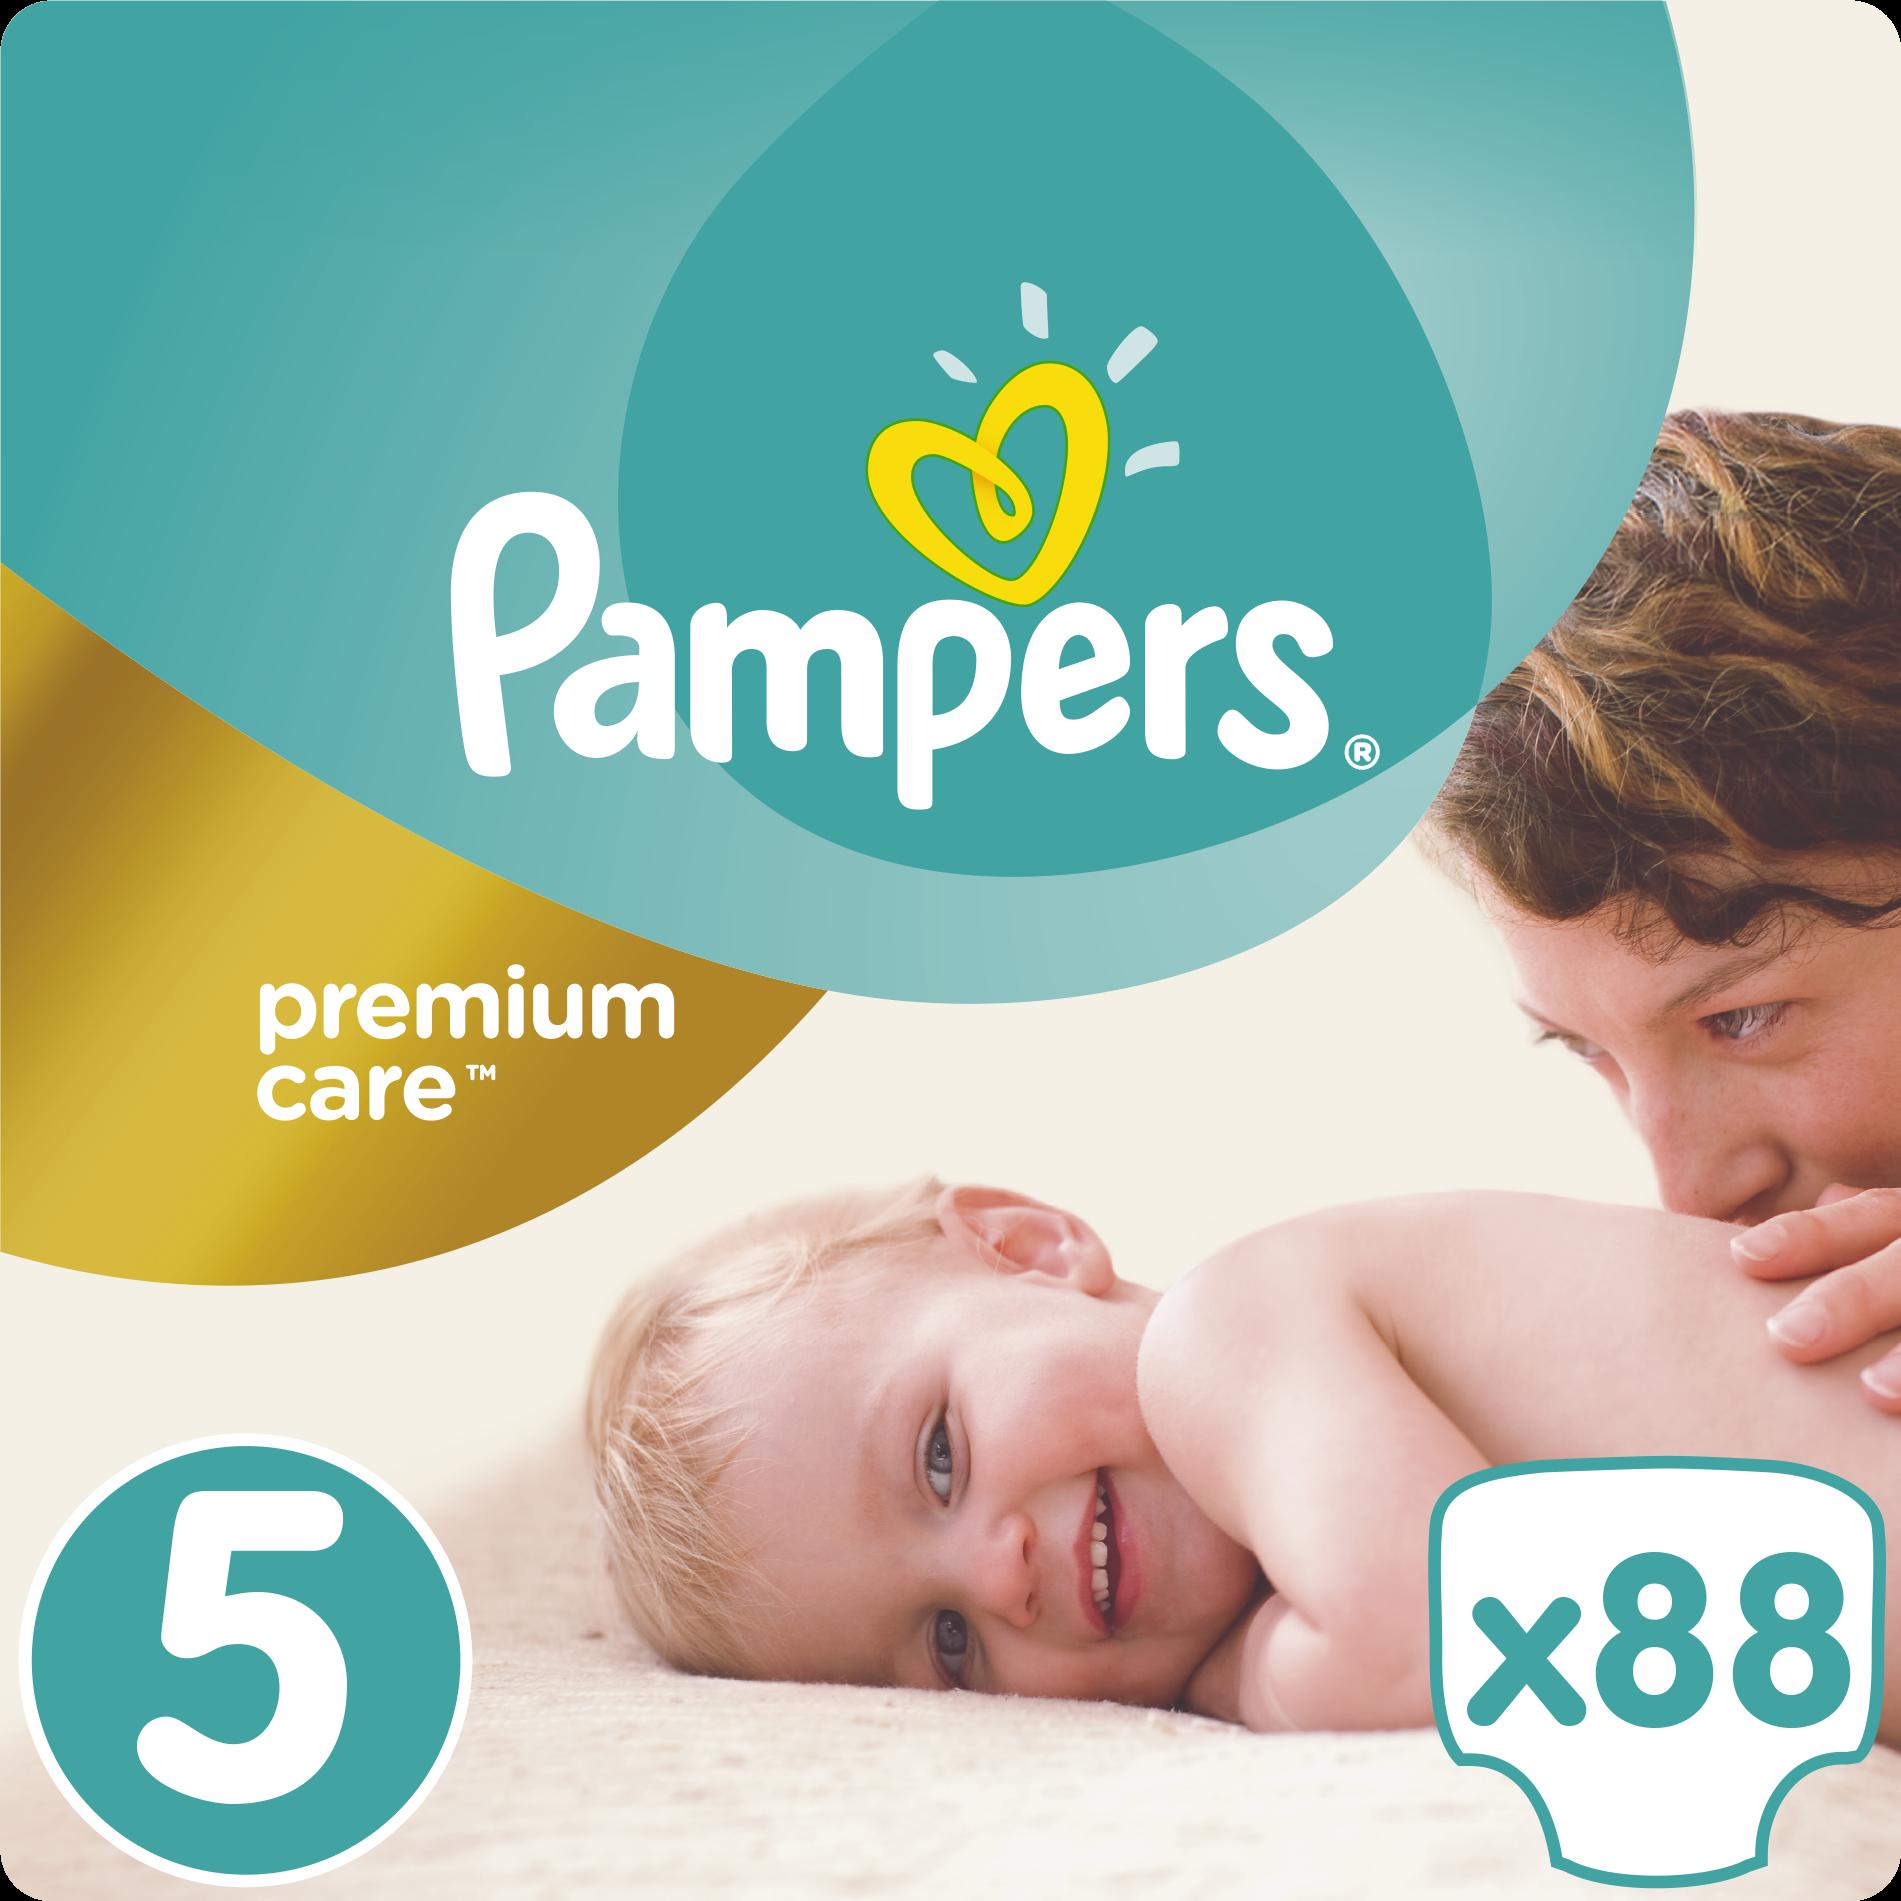 Pampers Premium Care No5 Maxi Plus (11-18kg) 88 πάνες μητέρα παιδί   περιποίηση για το μωρό   πάνες για το μωρό